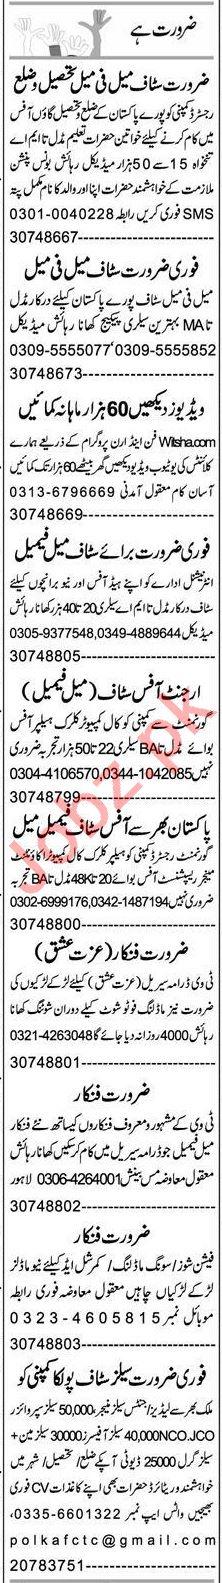 Express Sunday Multan Classified Ads 25 Oct 2020